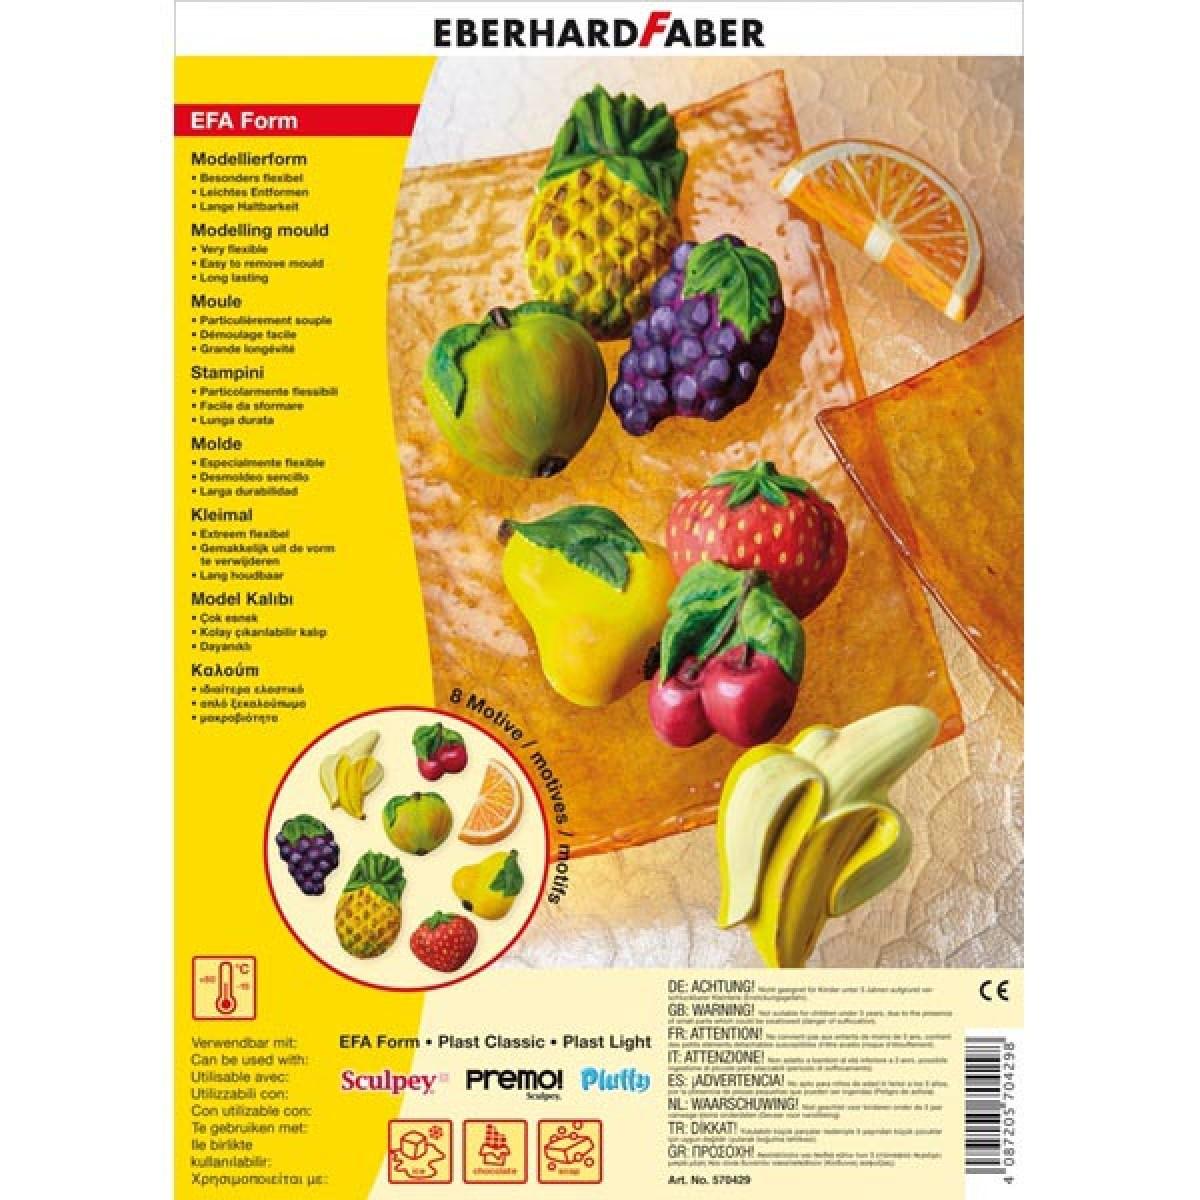 Eberhard Faber Καλούπι Fruits Είδη Ζωγραφικής